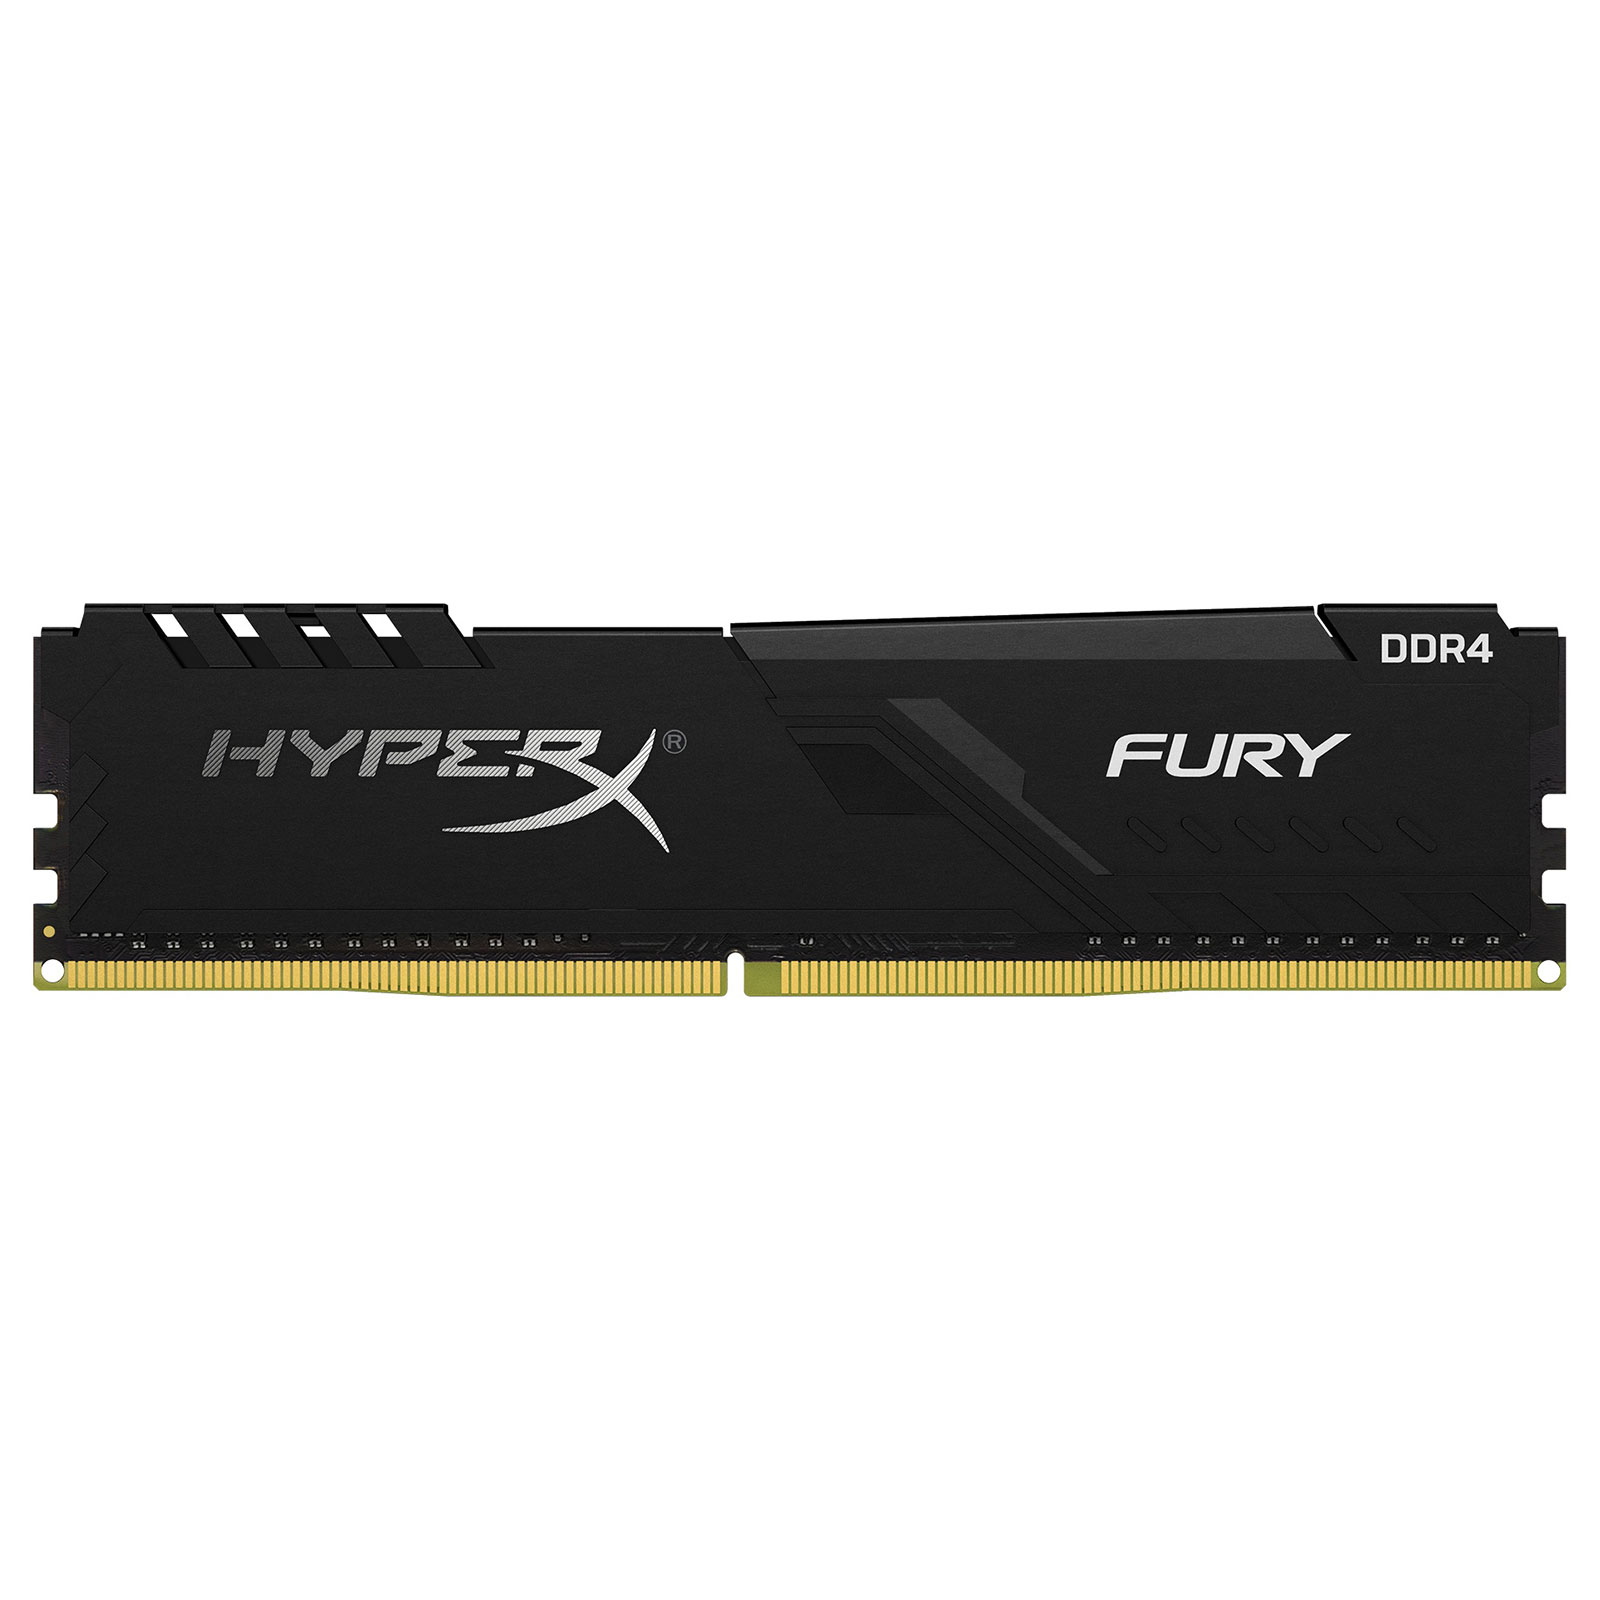 Fury - 8Go - DDR4 3200Mhz - CAS 16 - Noir